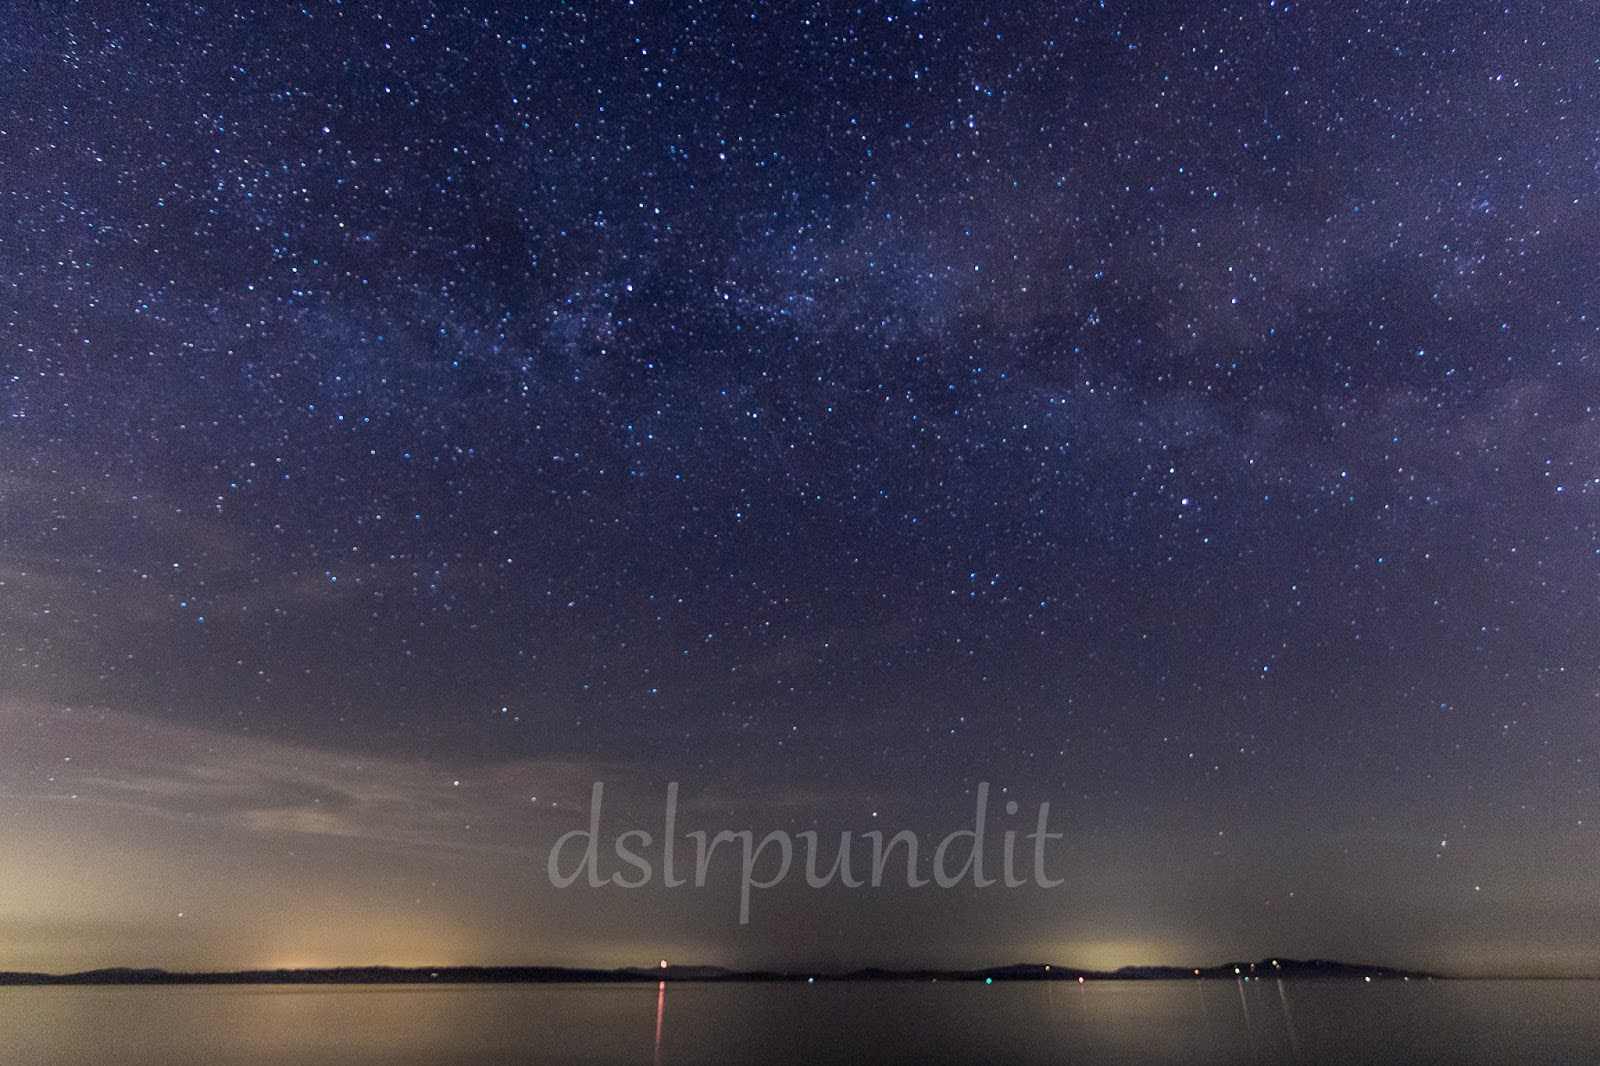 Night dslr photography